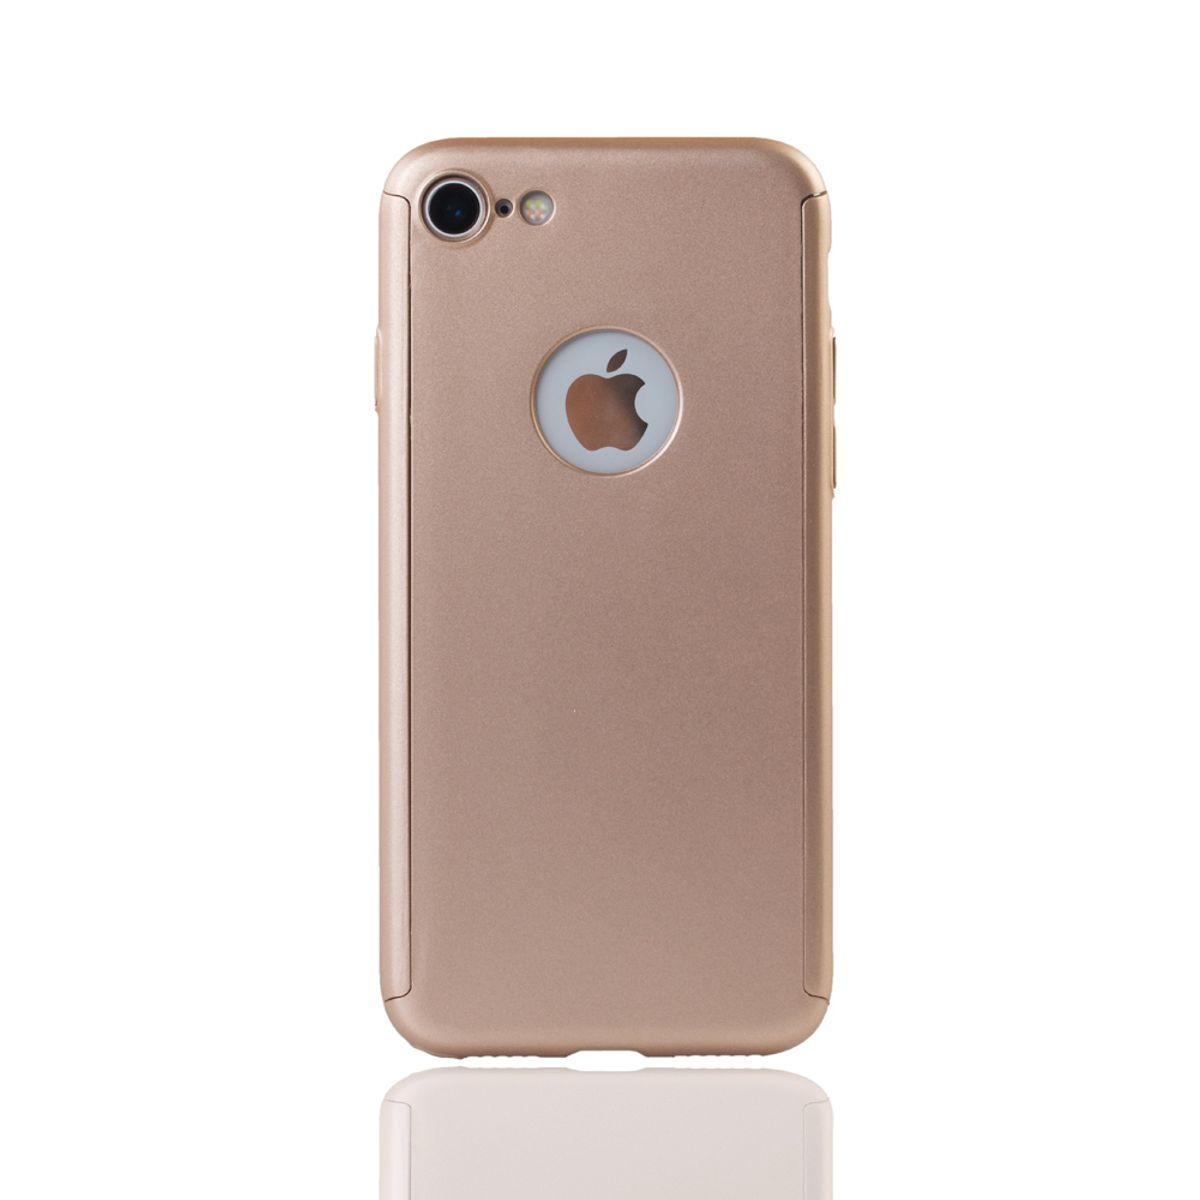 apple iphone 7 handy h lle schutz case 360 full cover panzer schutz glas gold. Black Bedroom Furniture Sets. Home Design Ideas